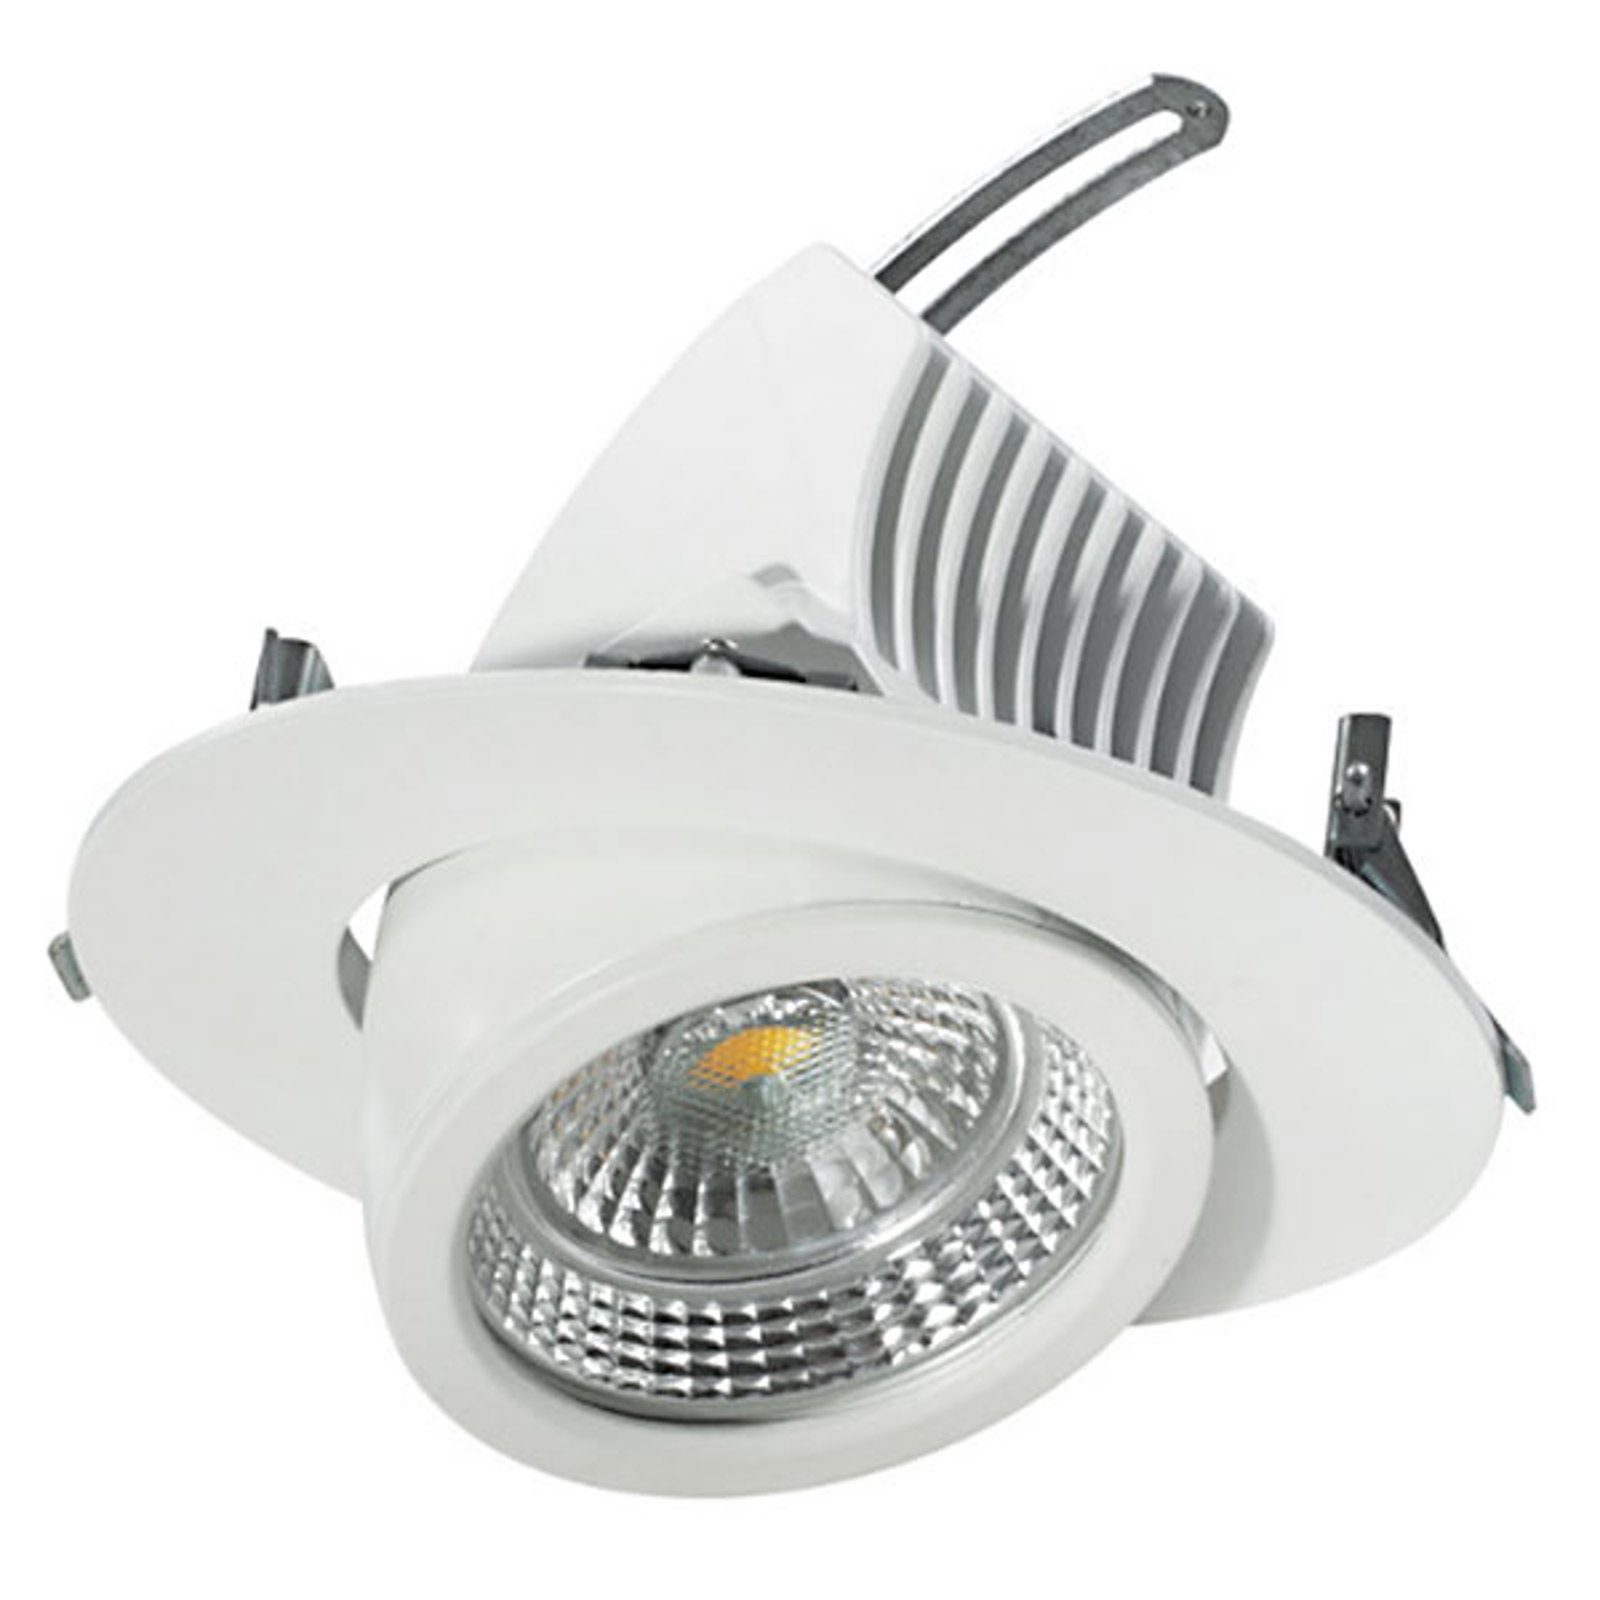 Draaibare LED inbouwspot 20 cm, 48 W